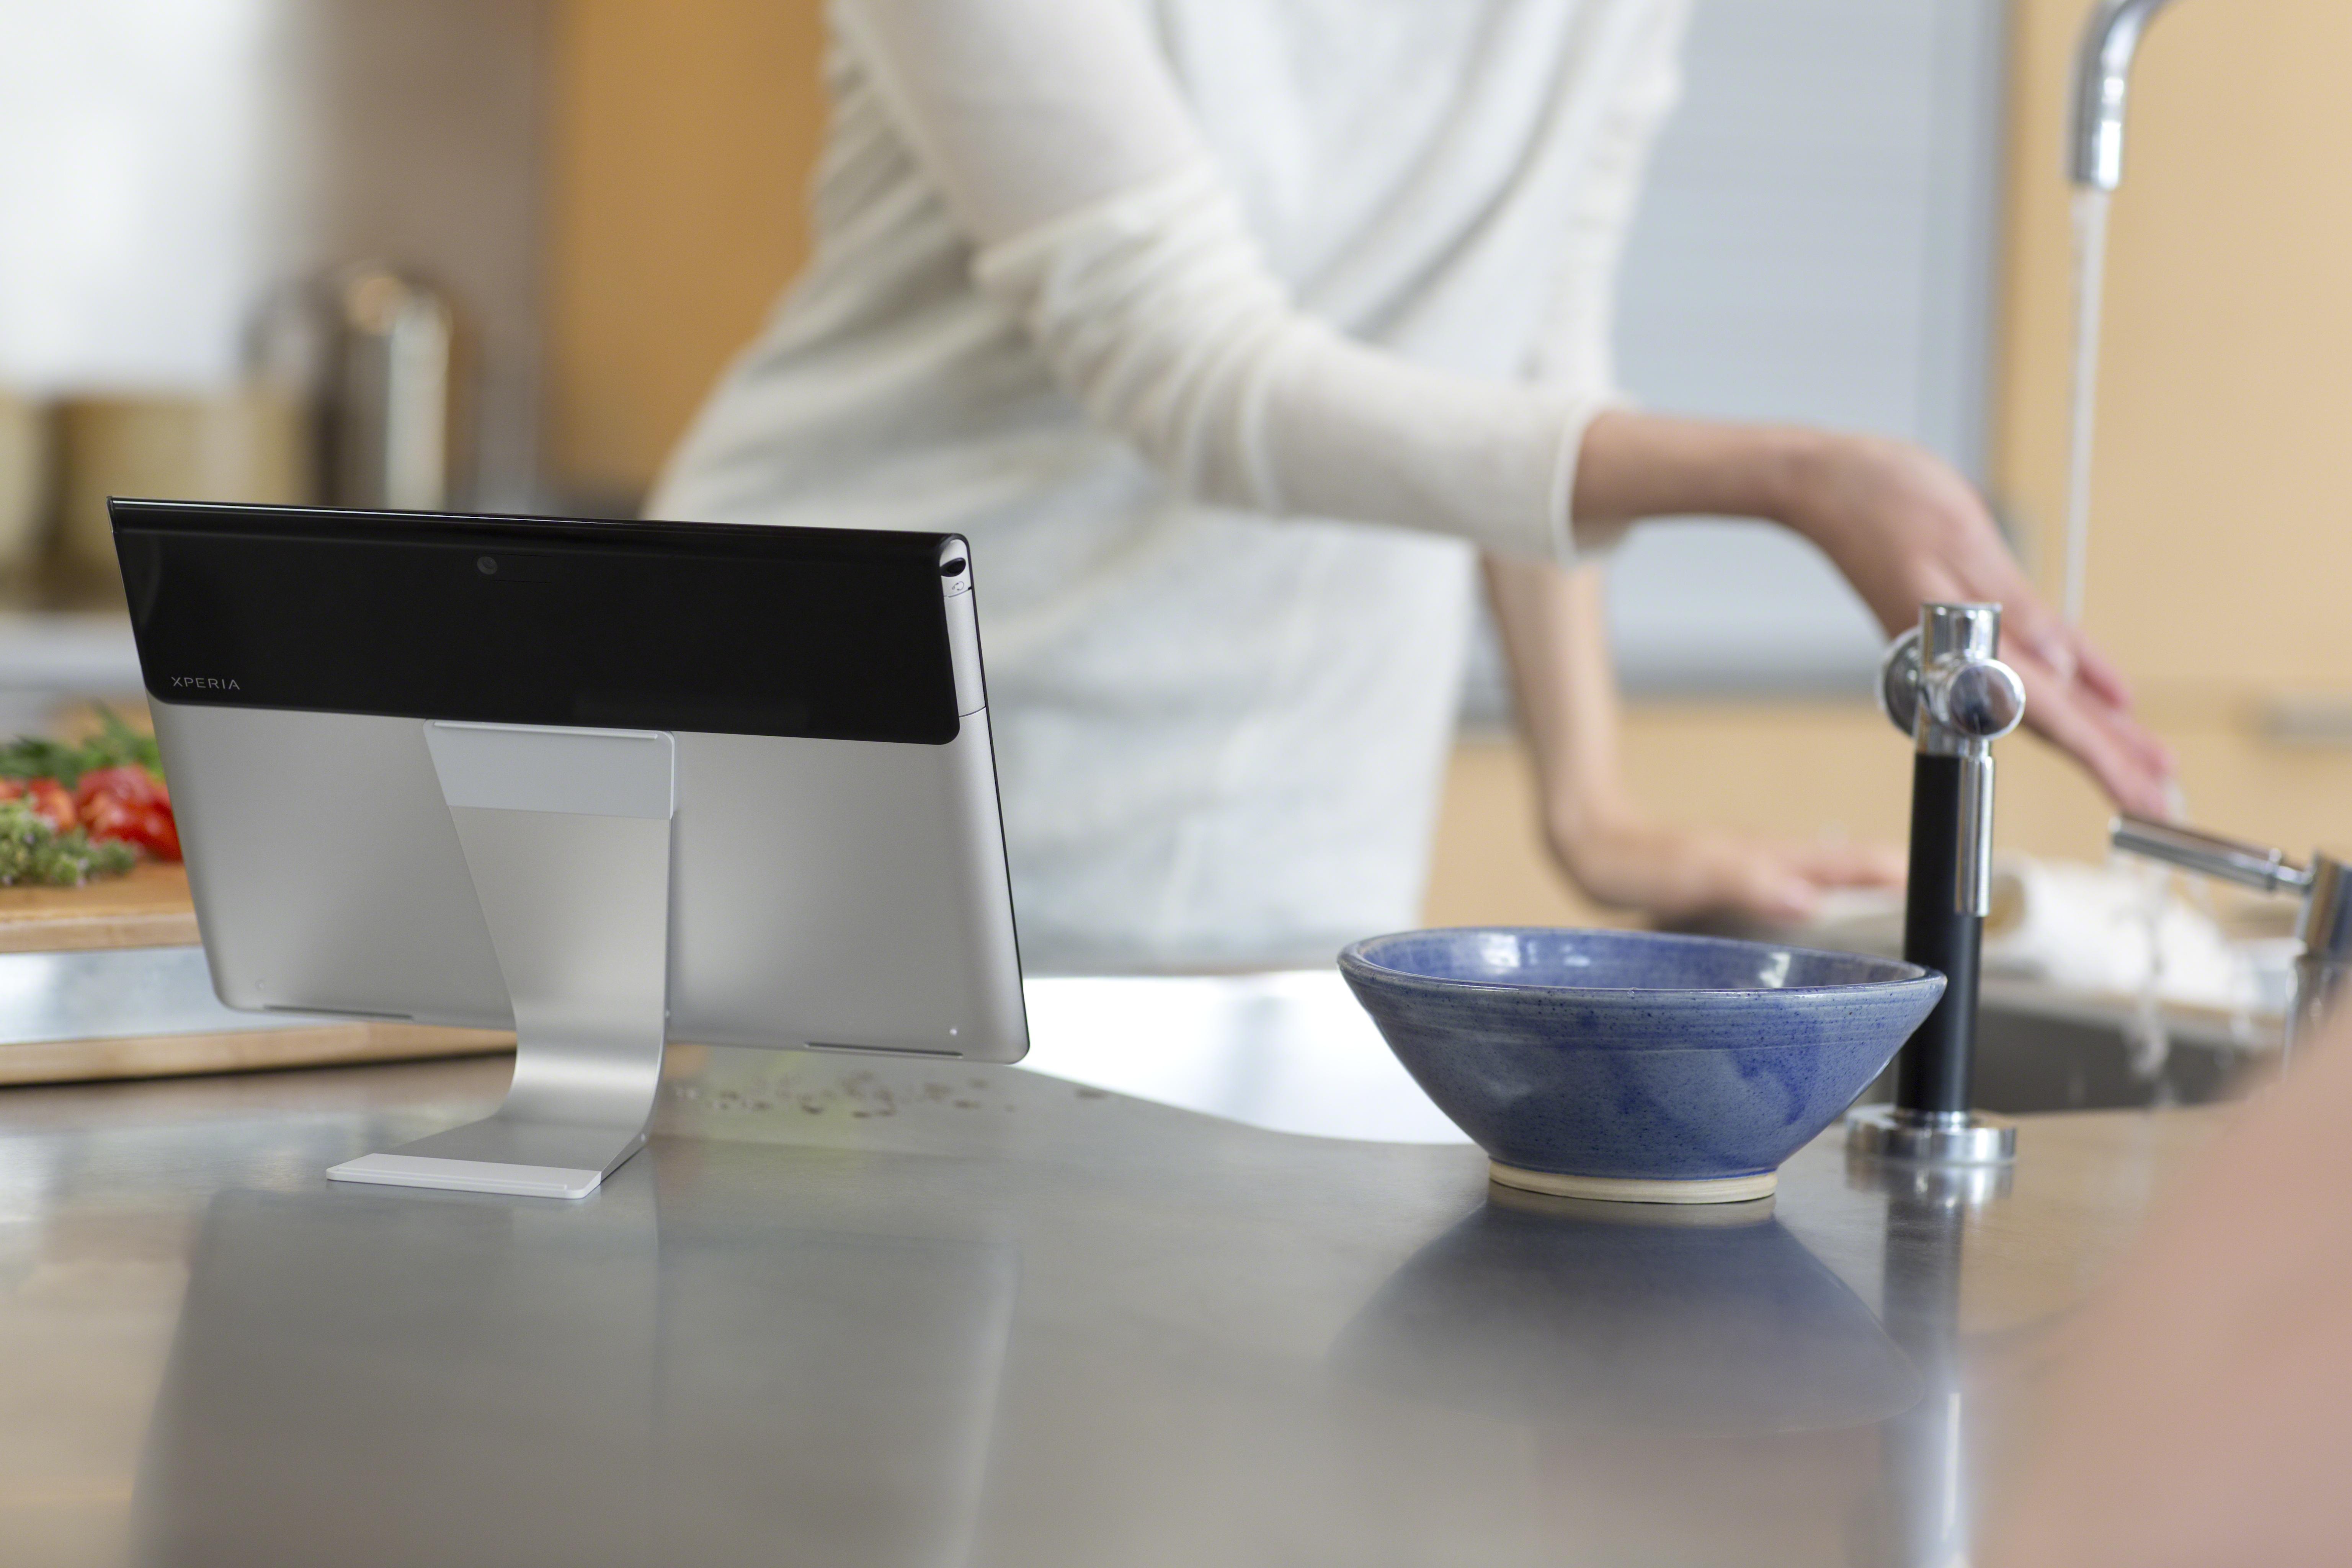 7_S_kitchen_splashproof_tabletstand1